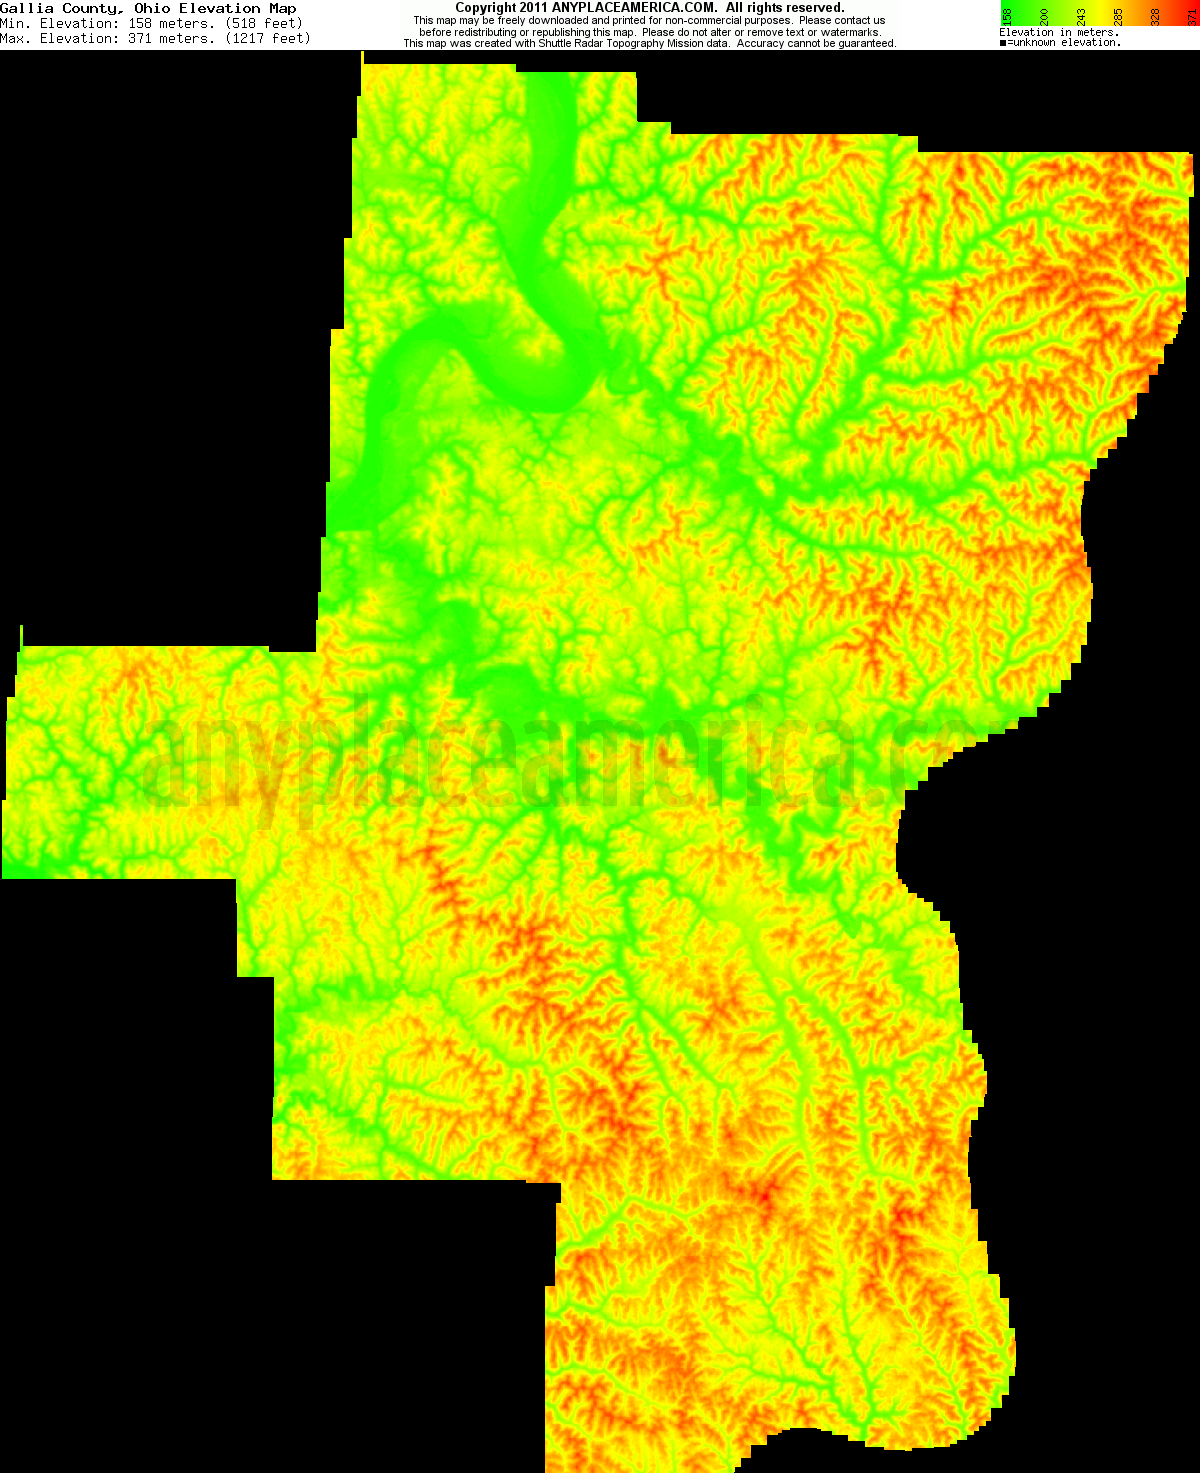 Free Gallia County Ohio Topo Maps Amp Elevations